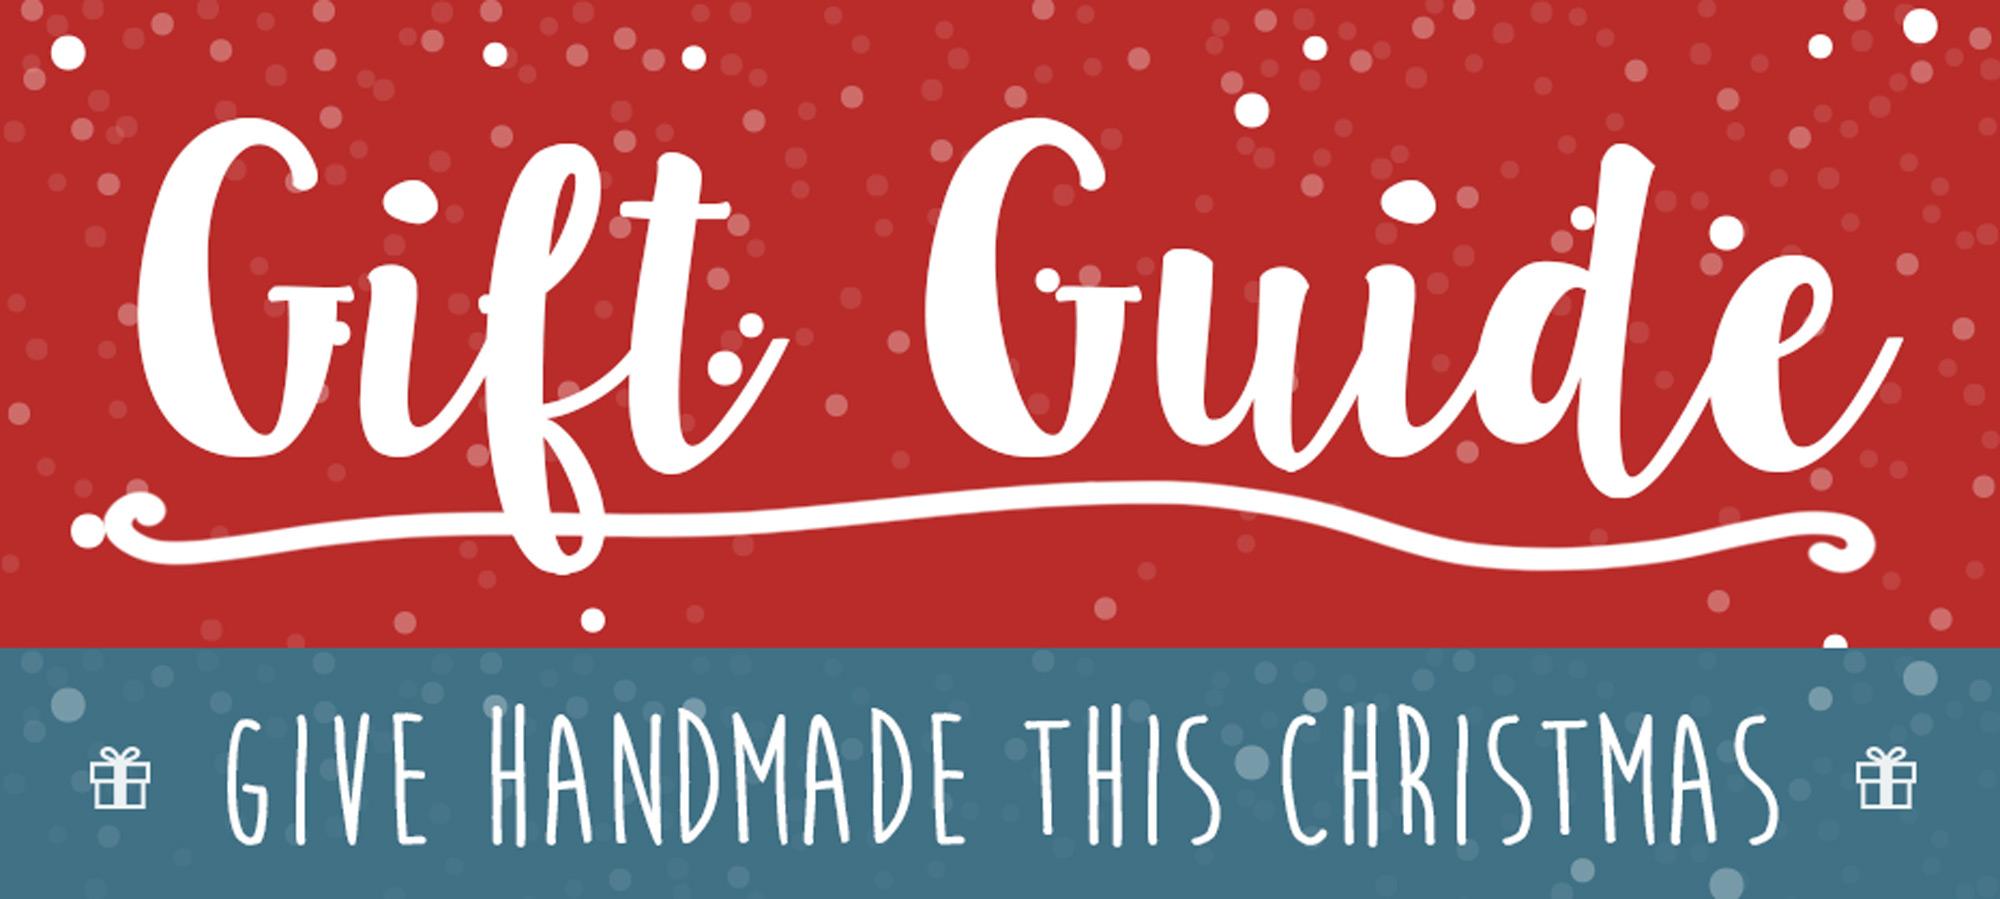 Gift Guide - Give Handmade